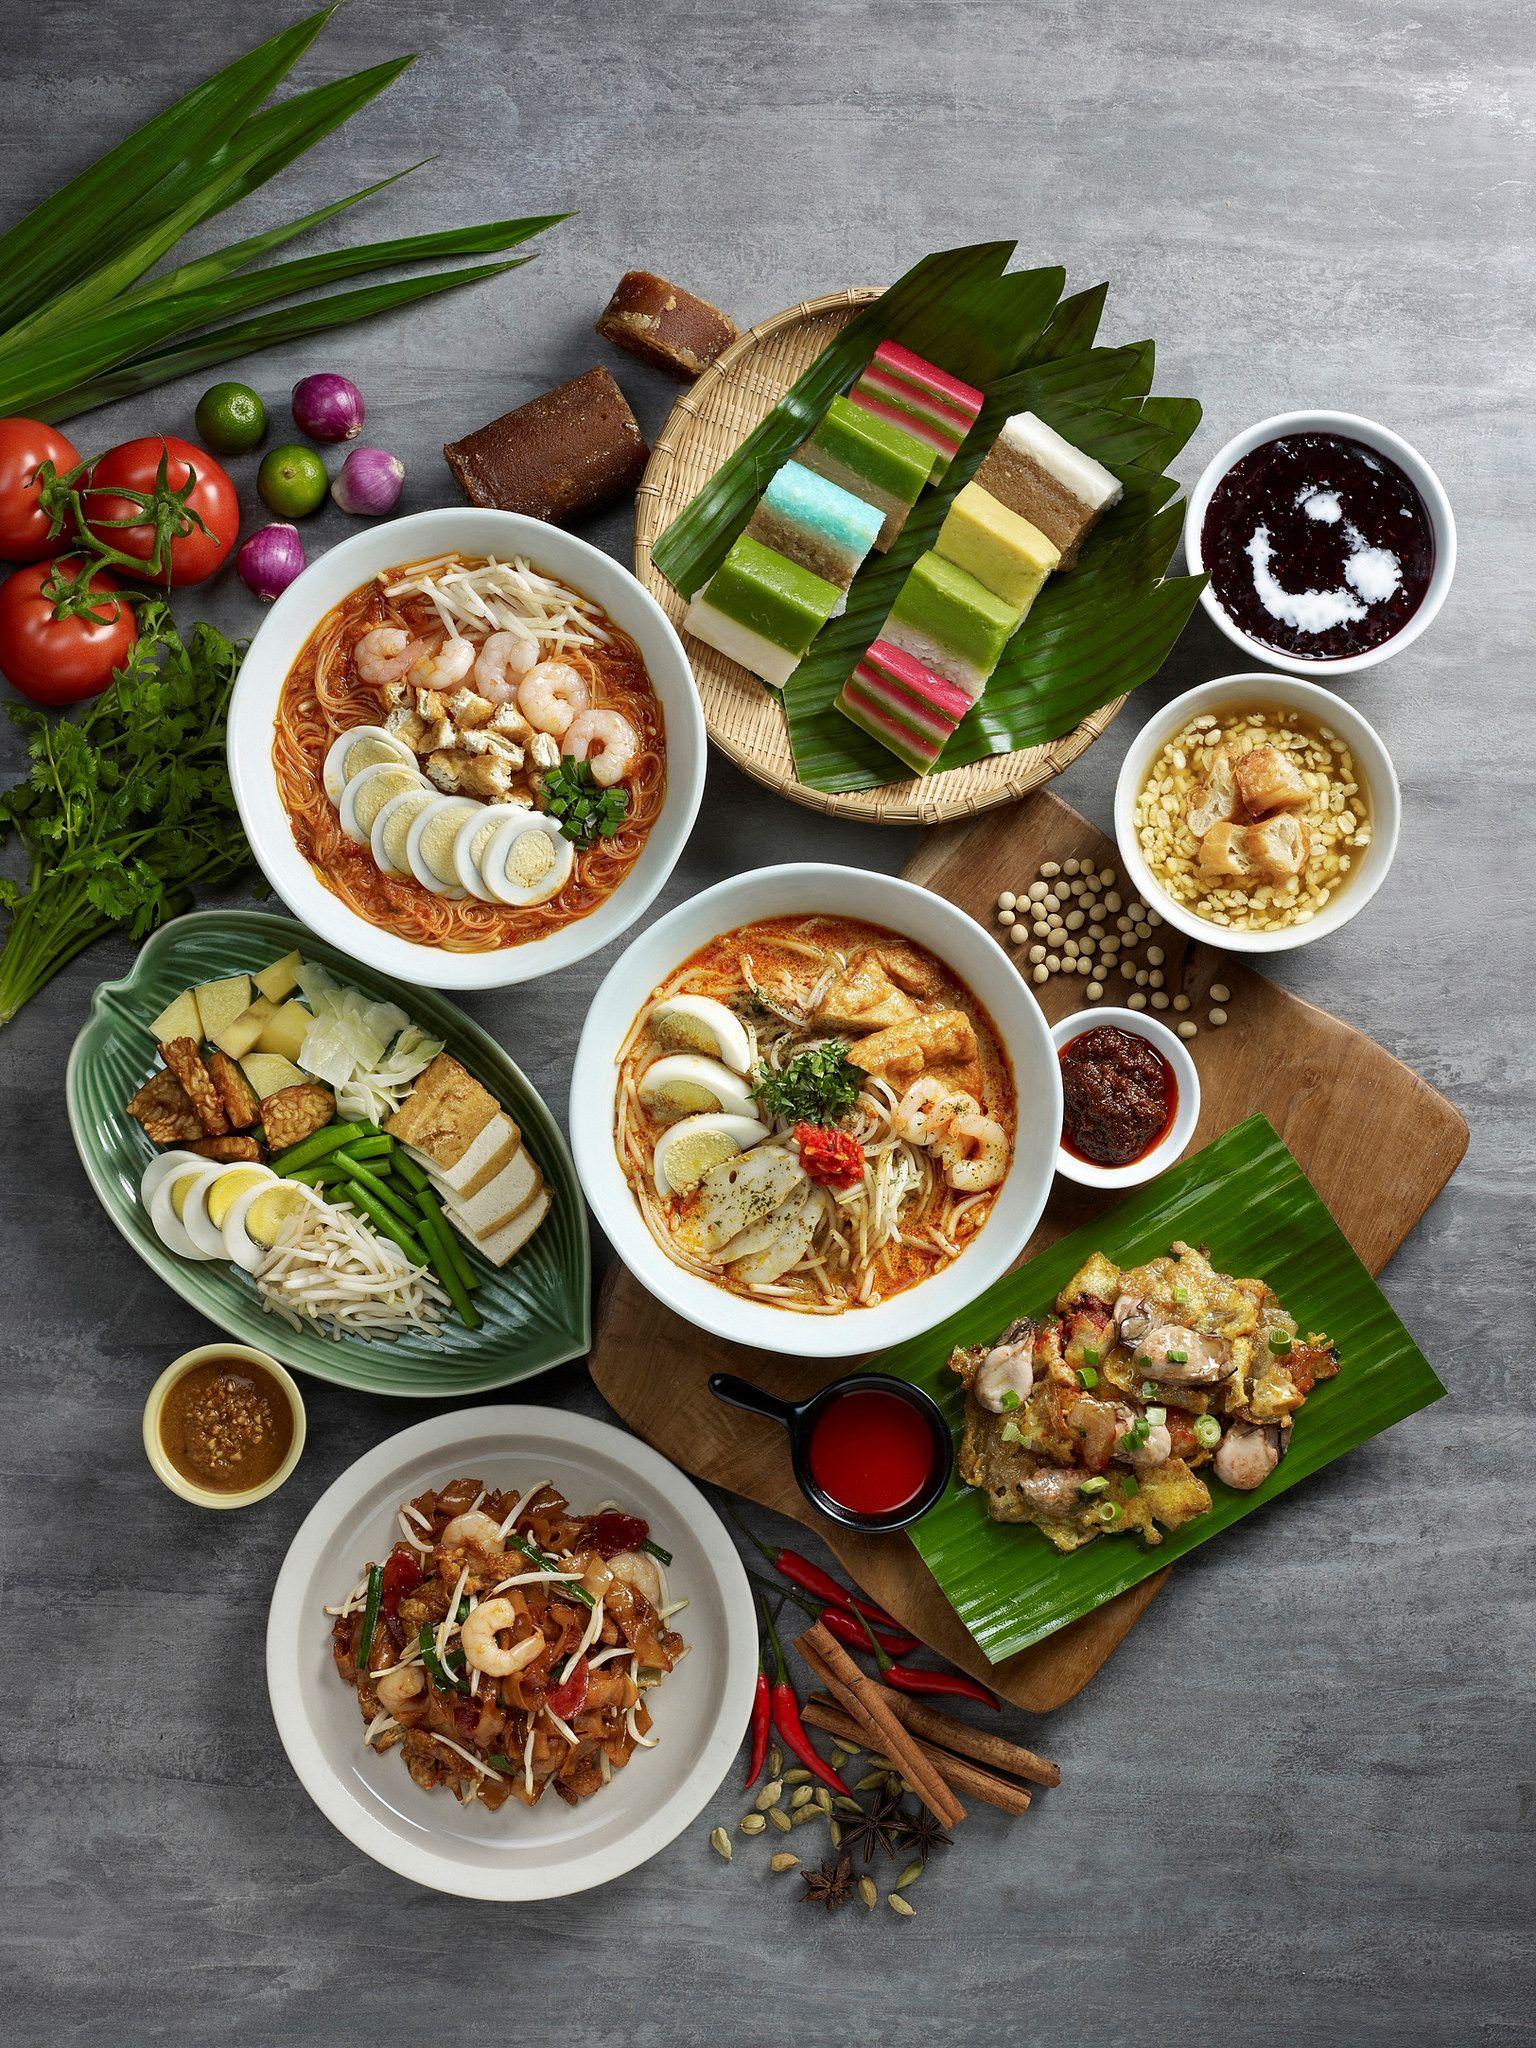 Lasak thaicuisine asiame delicious tasty yummy why